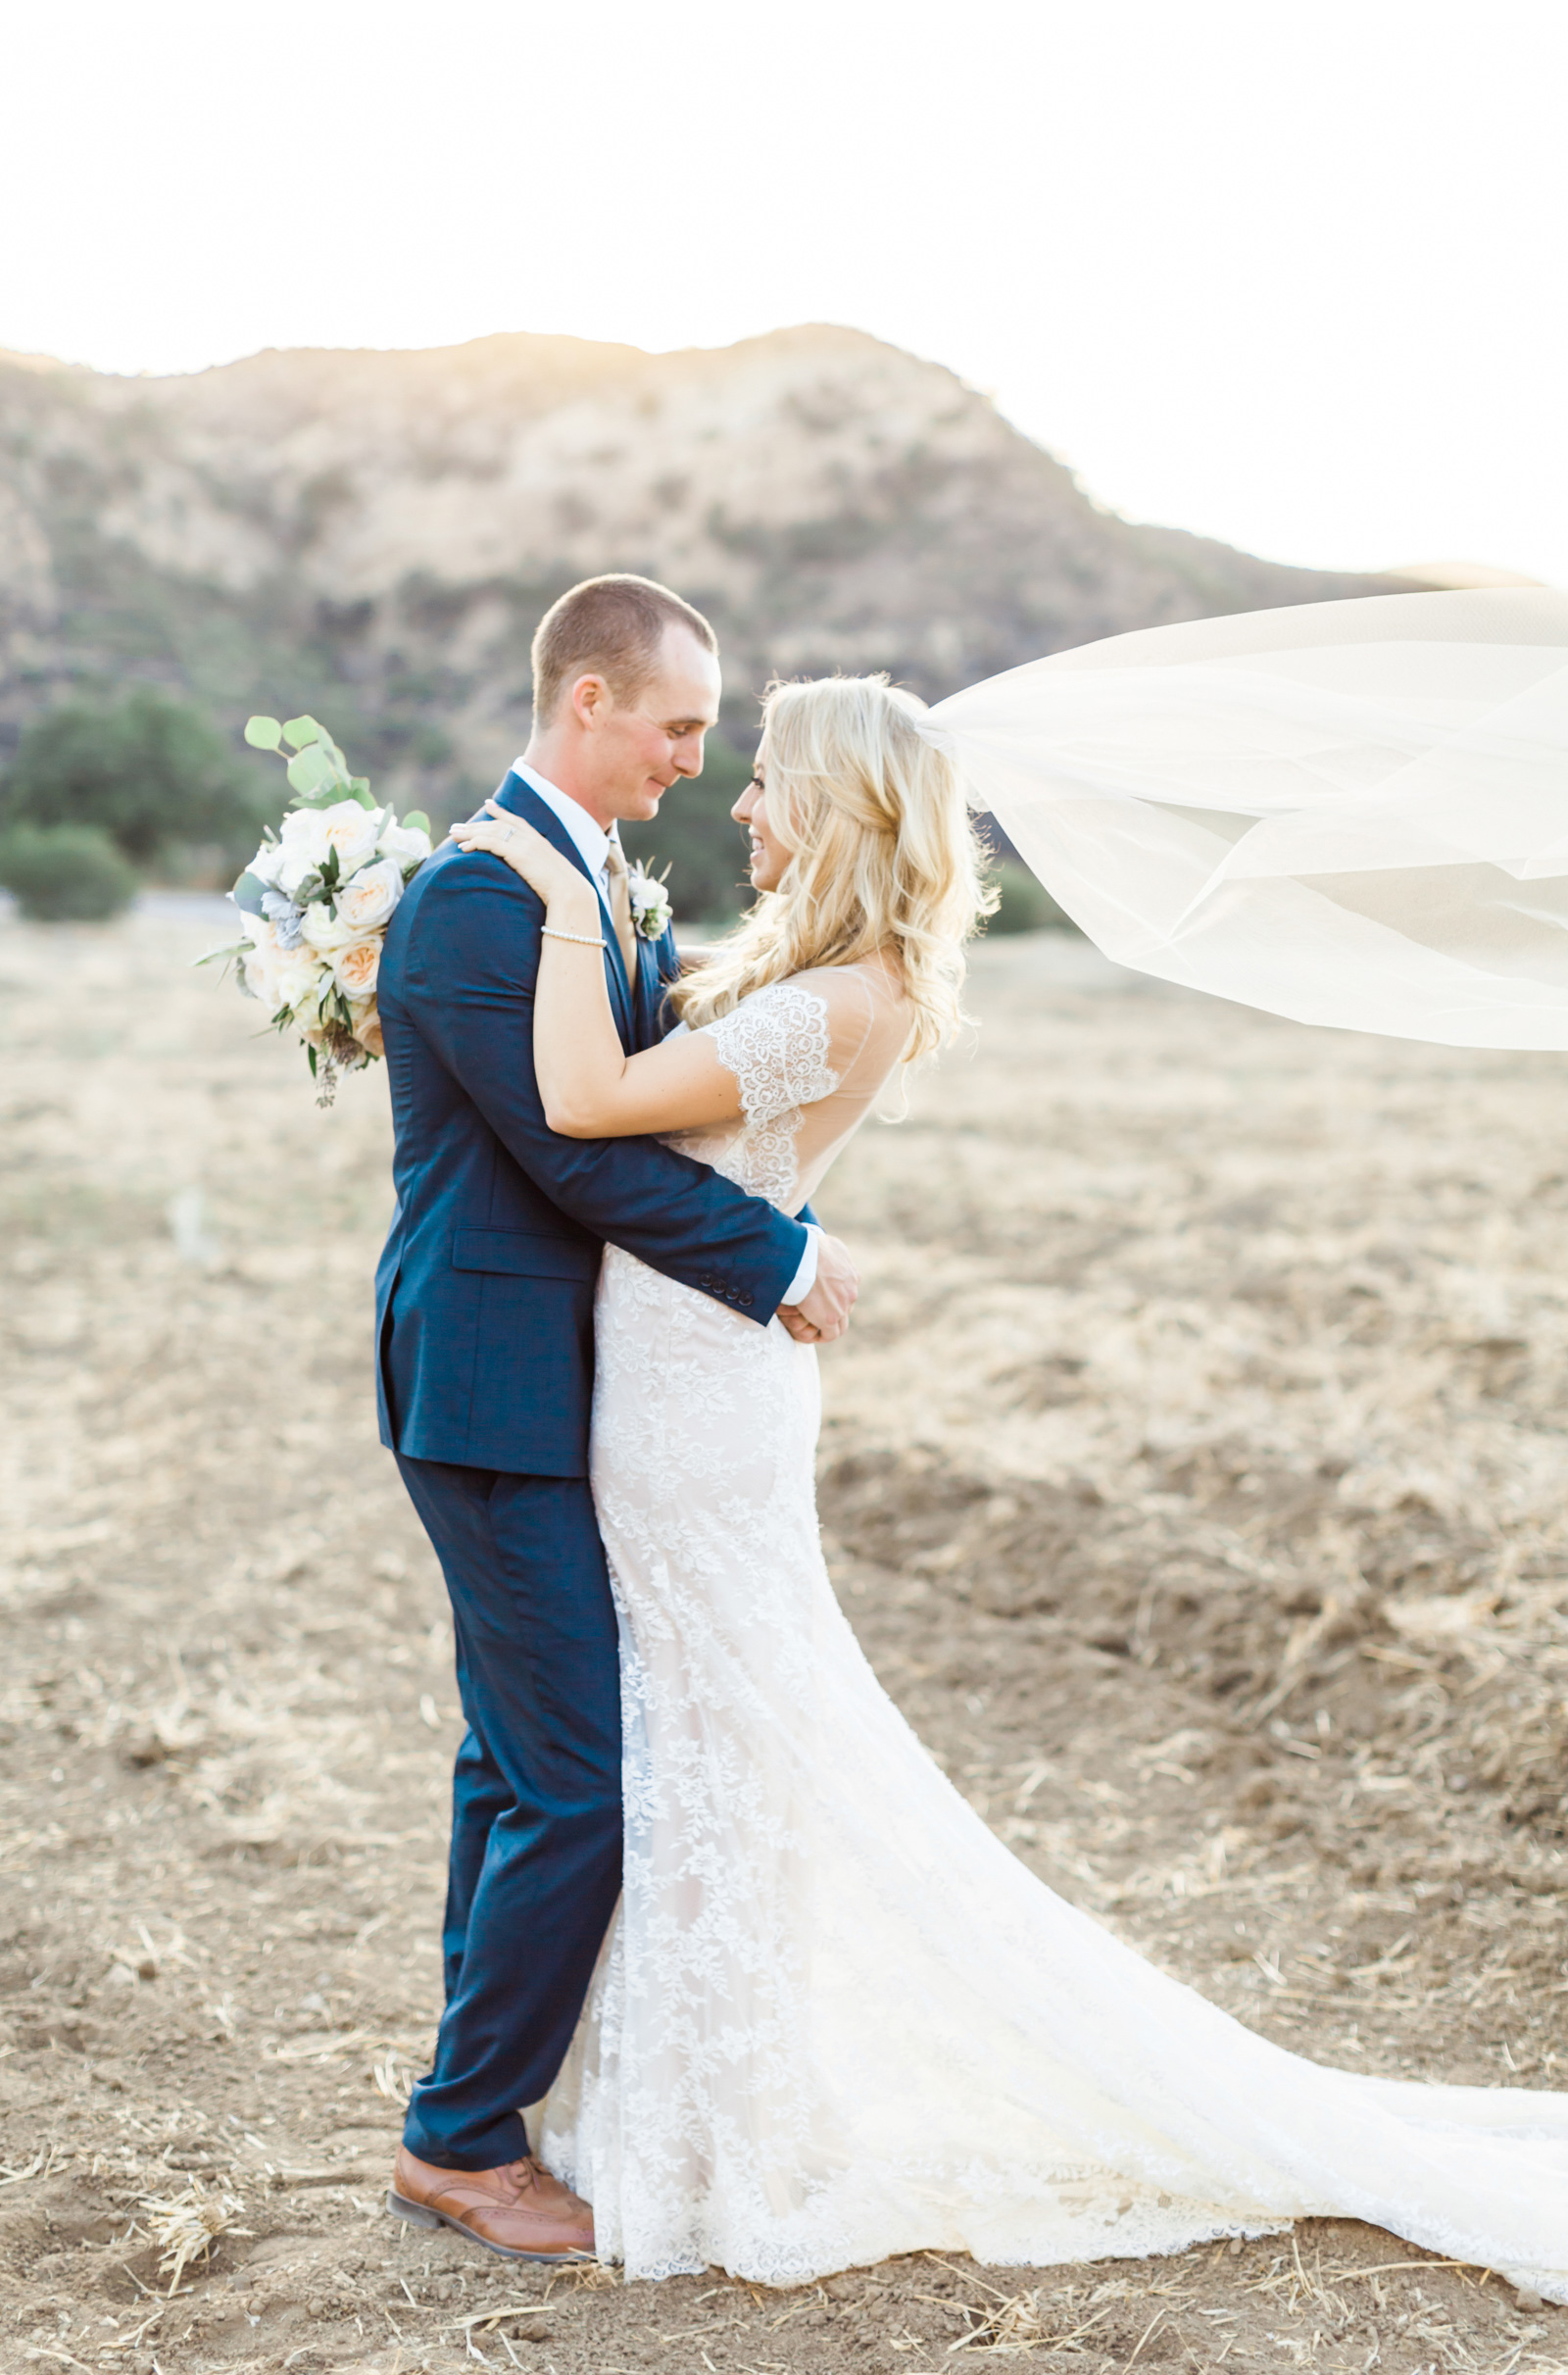 California-Wedding-Photographer-Style-Me-Pretty-Natalie-Schutt-San-Luis-Obispo_02.jpg